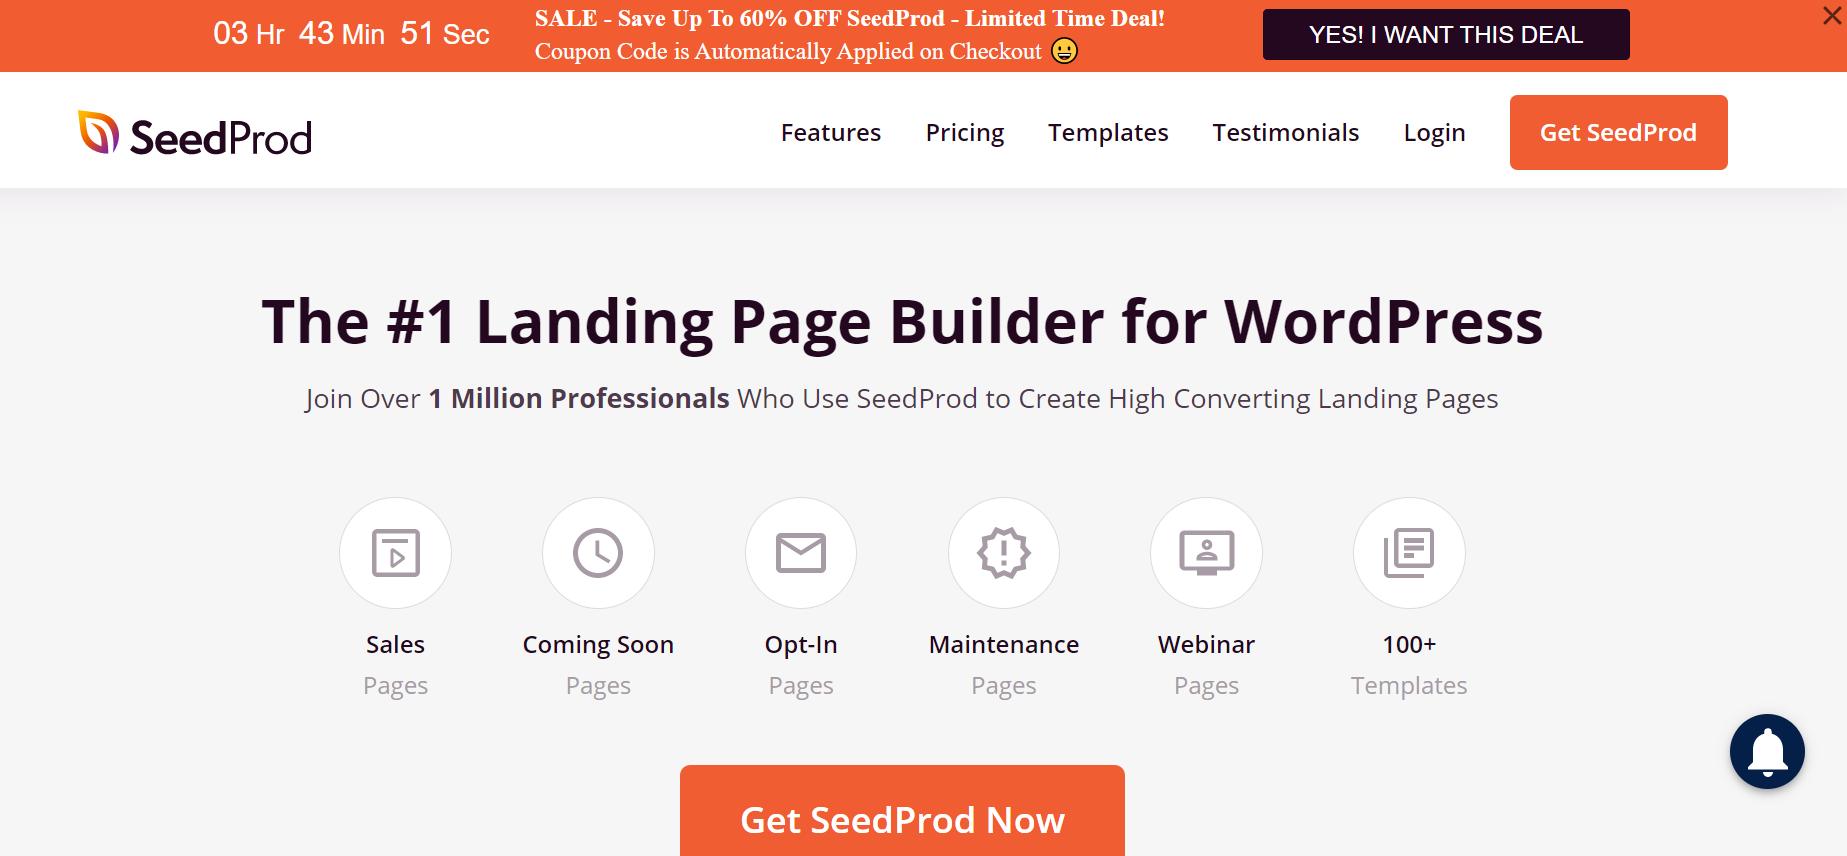 SeedProd-WooCommerce website